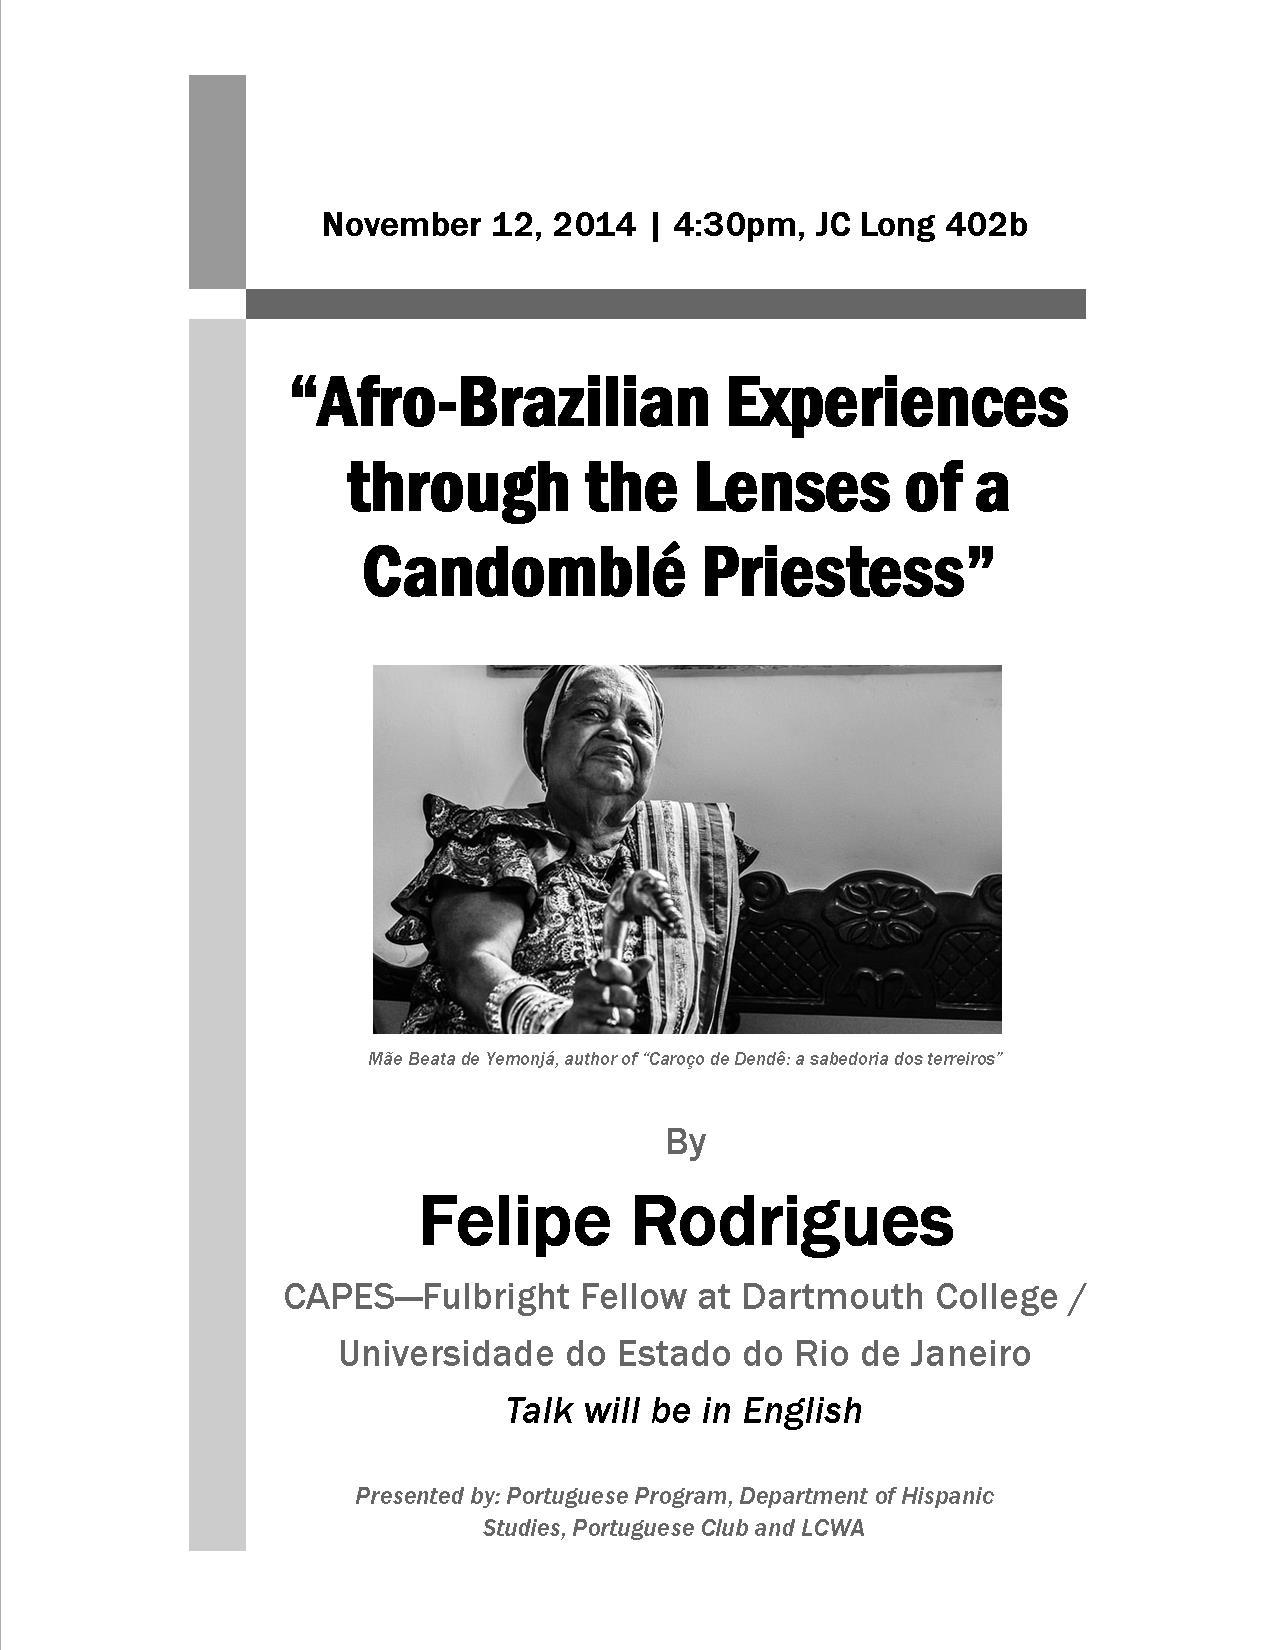 FelipeRodriguesTalk2014